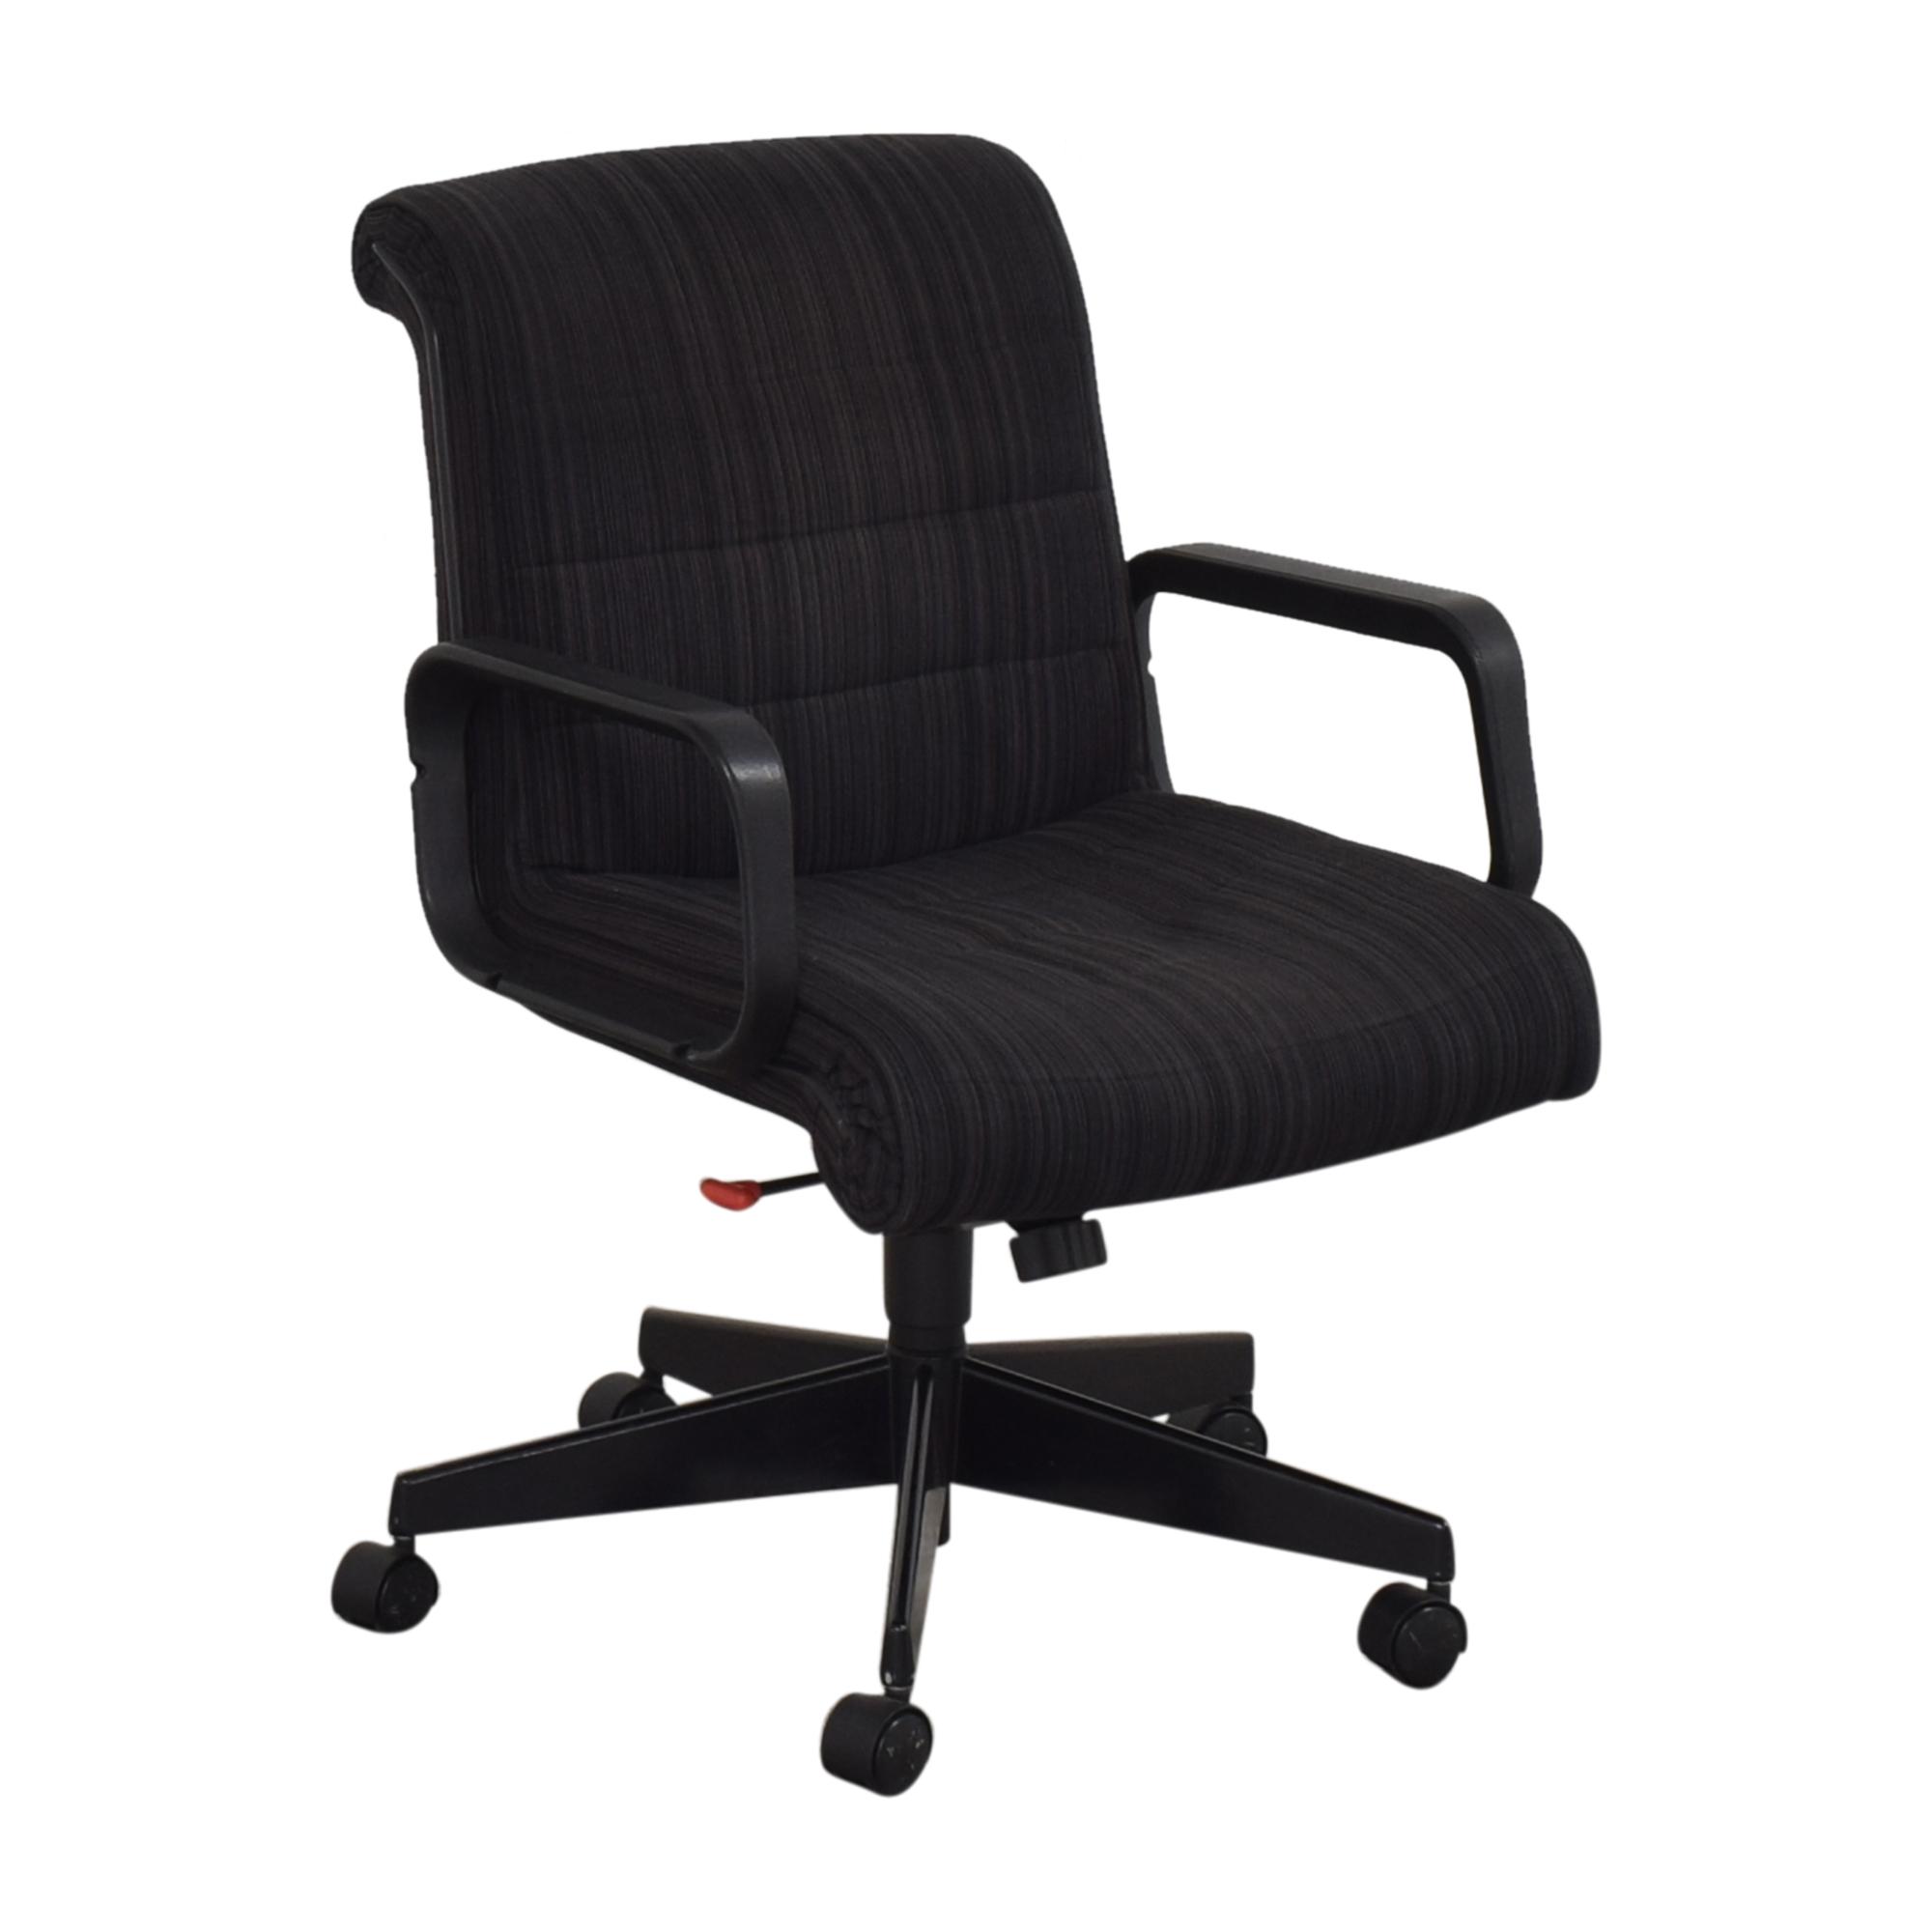 Knoll Knoll Richard Sapper Desk Chair nj